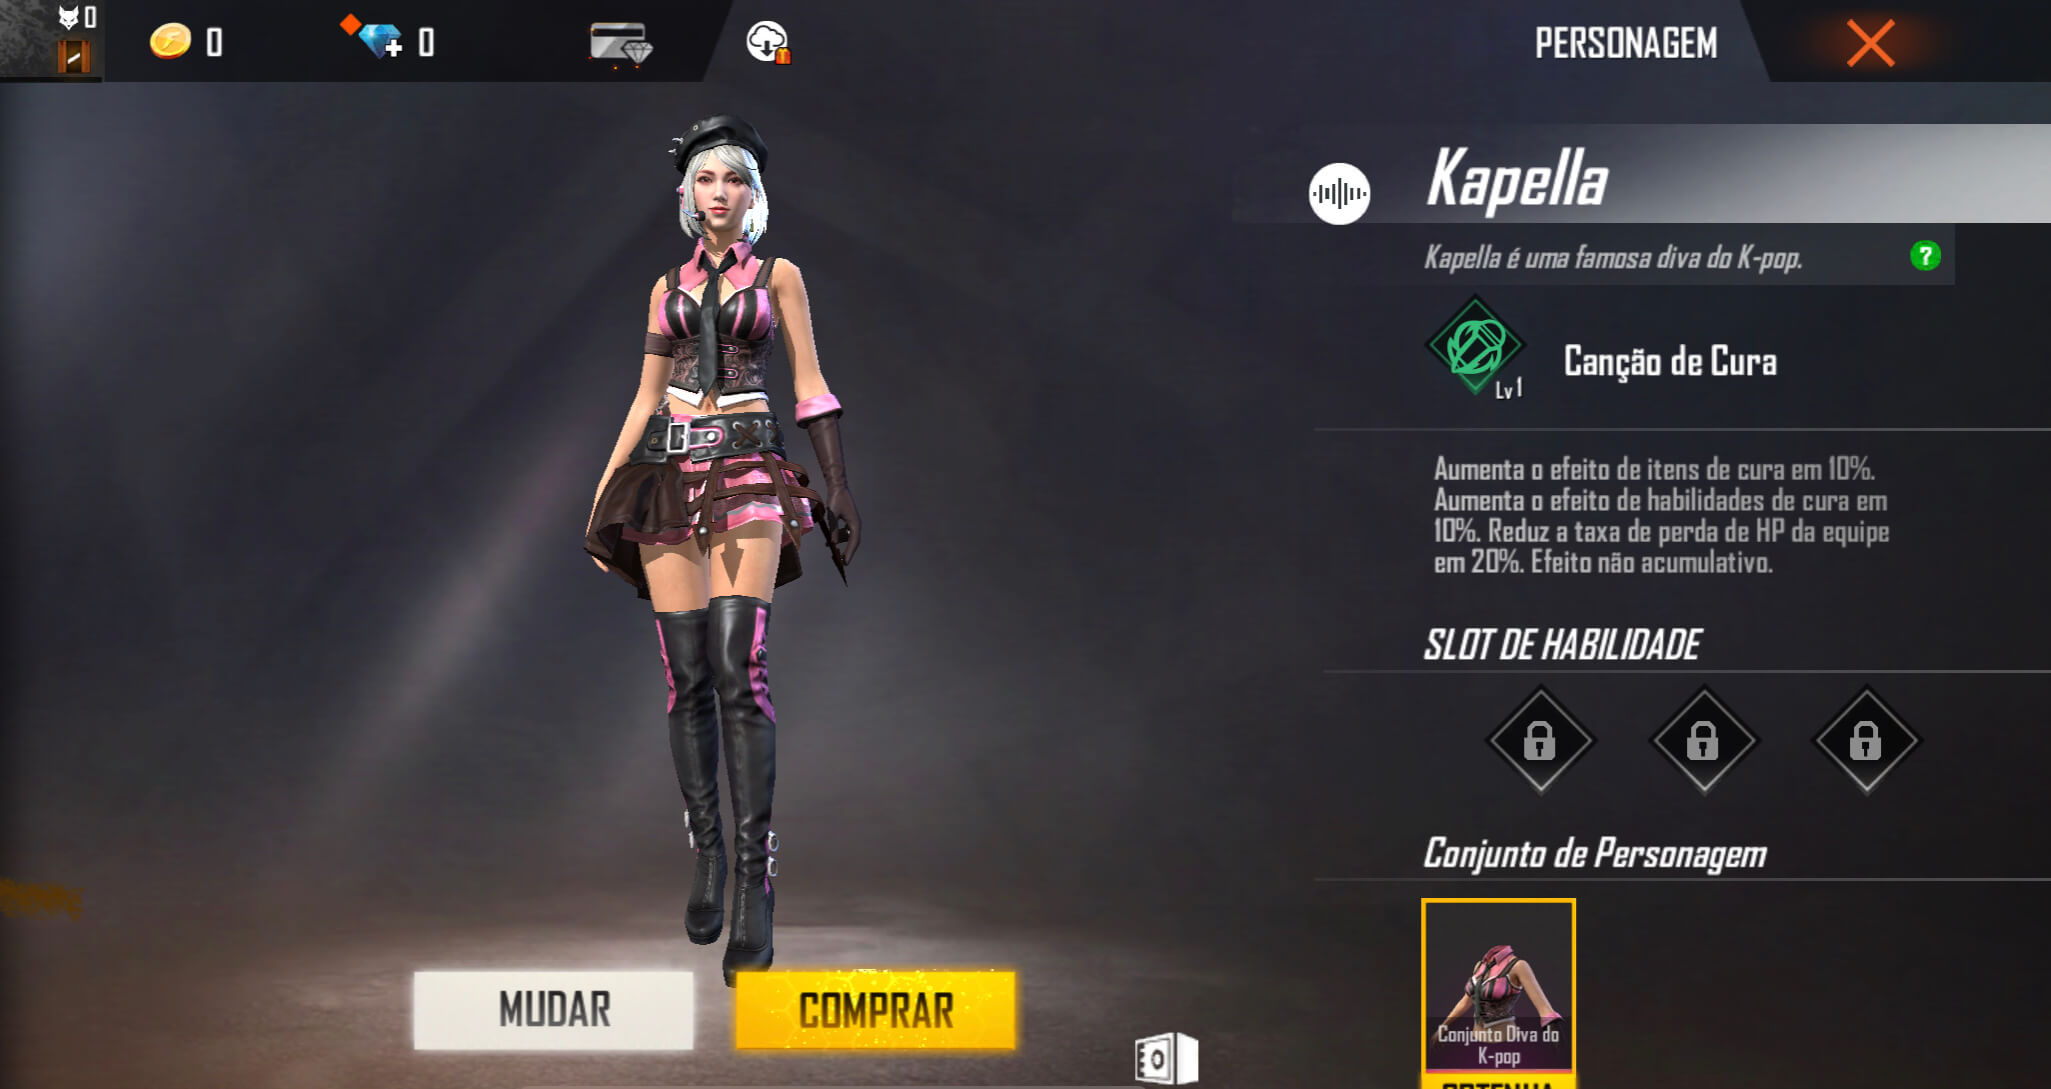 Personagens do Free Fire Kapella